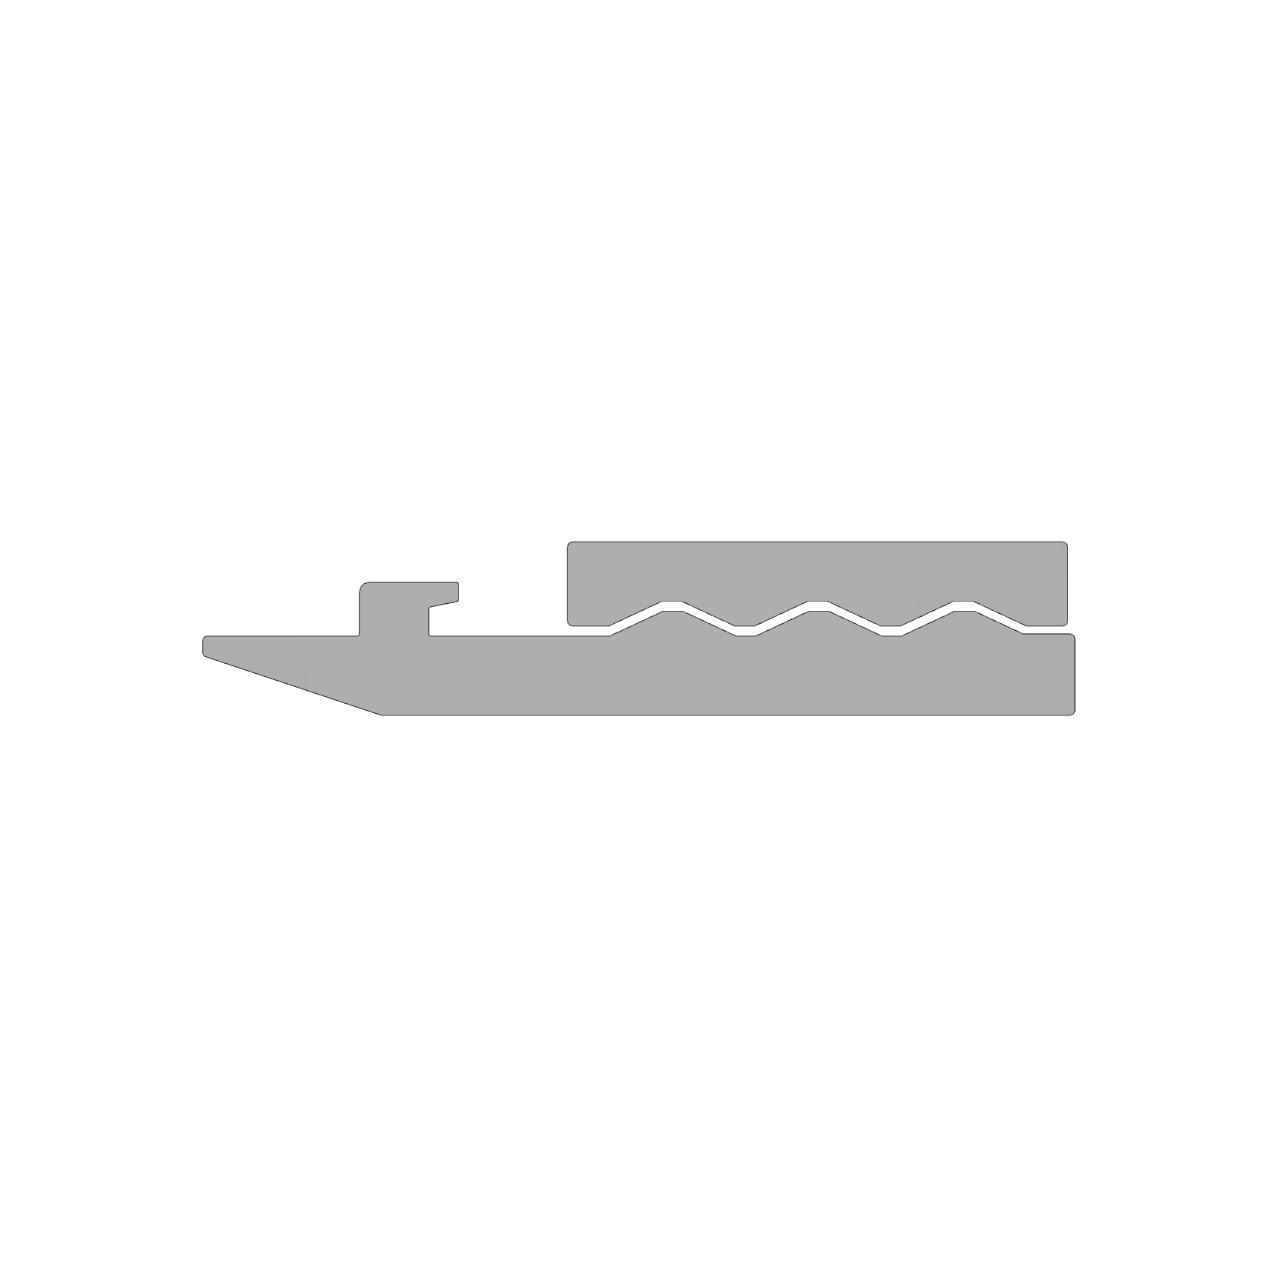 Schletter-KlickTop - Profile